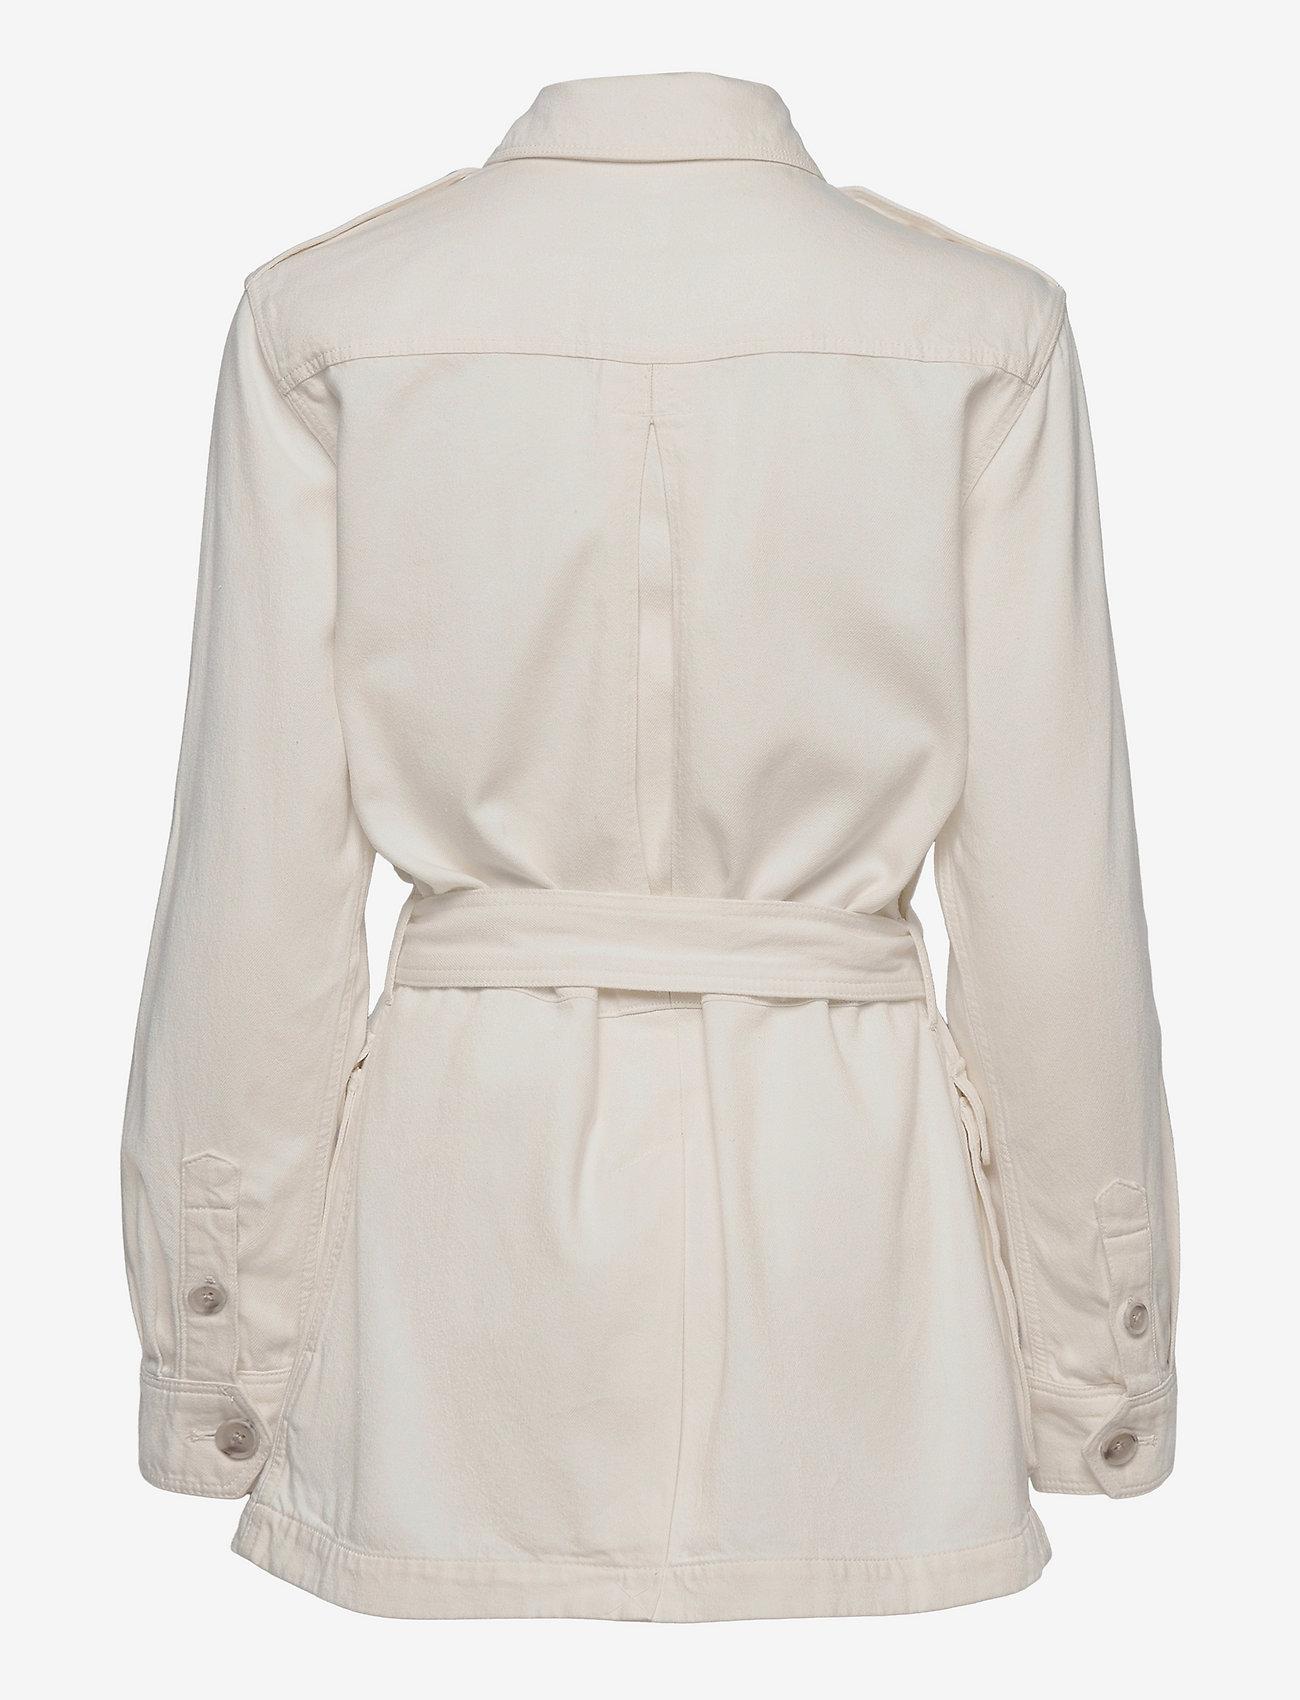 Polo Ralph Lauren - SFRI JKT-JACKET - utility jackets - natural - 1